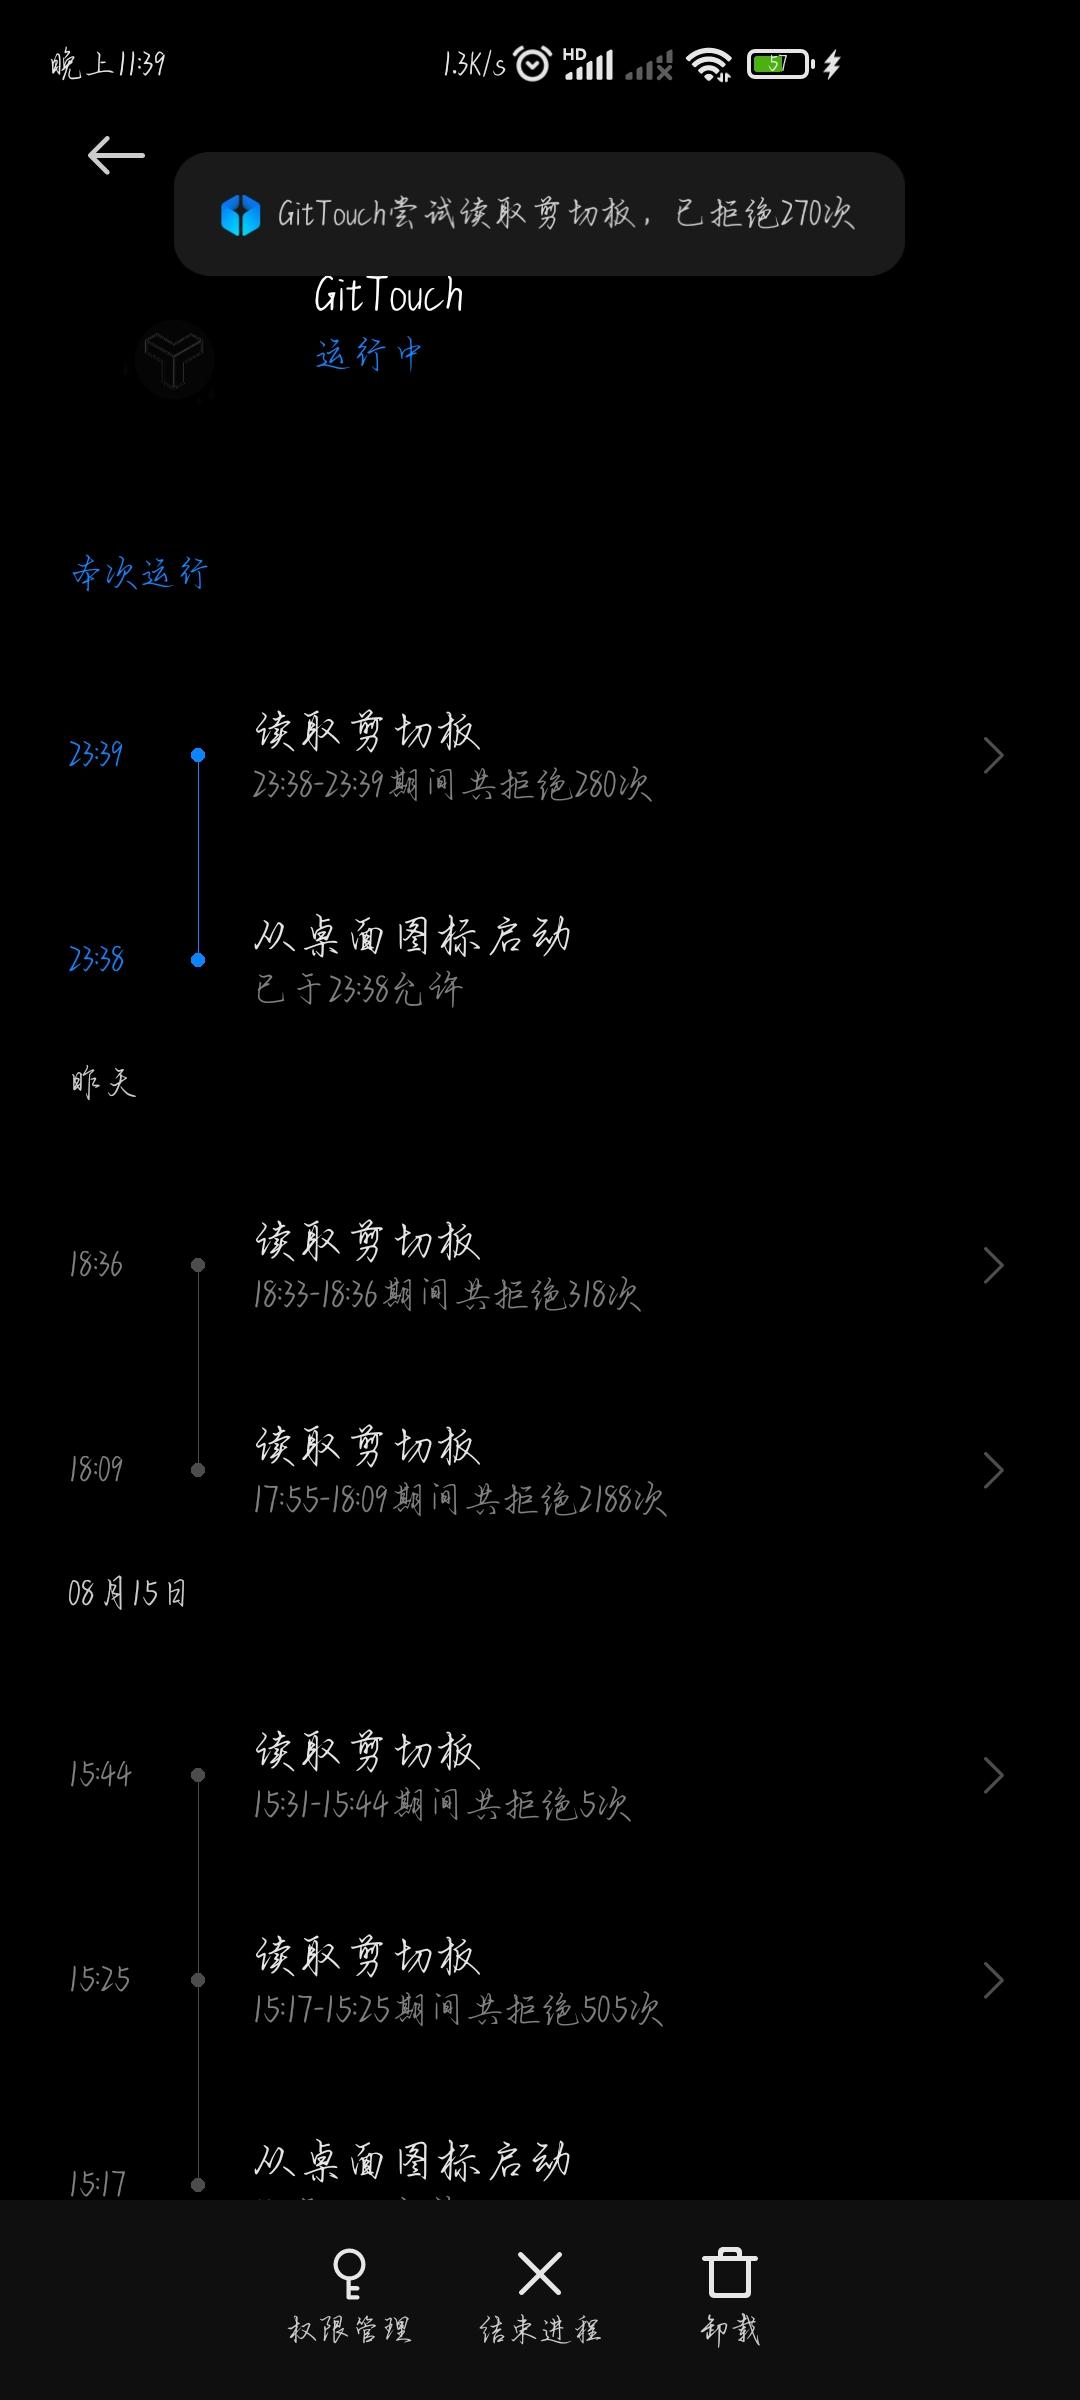 Screenshot_2021-08-20-23-39-44-356_com miui securitycenter